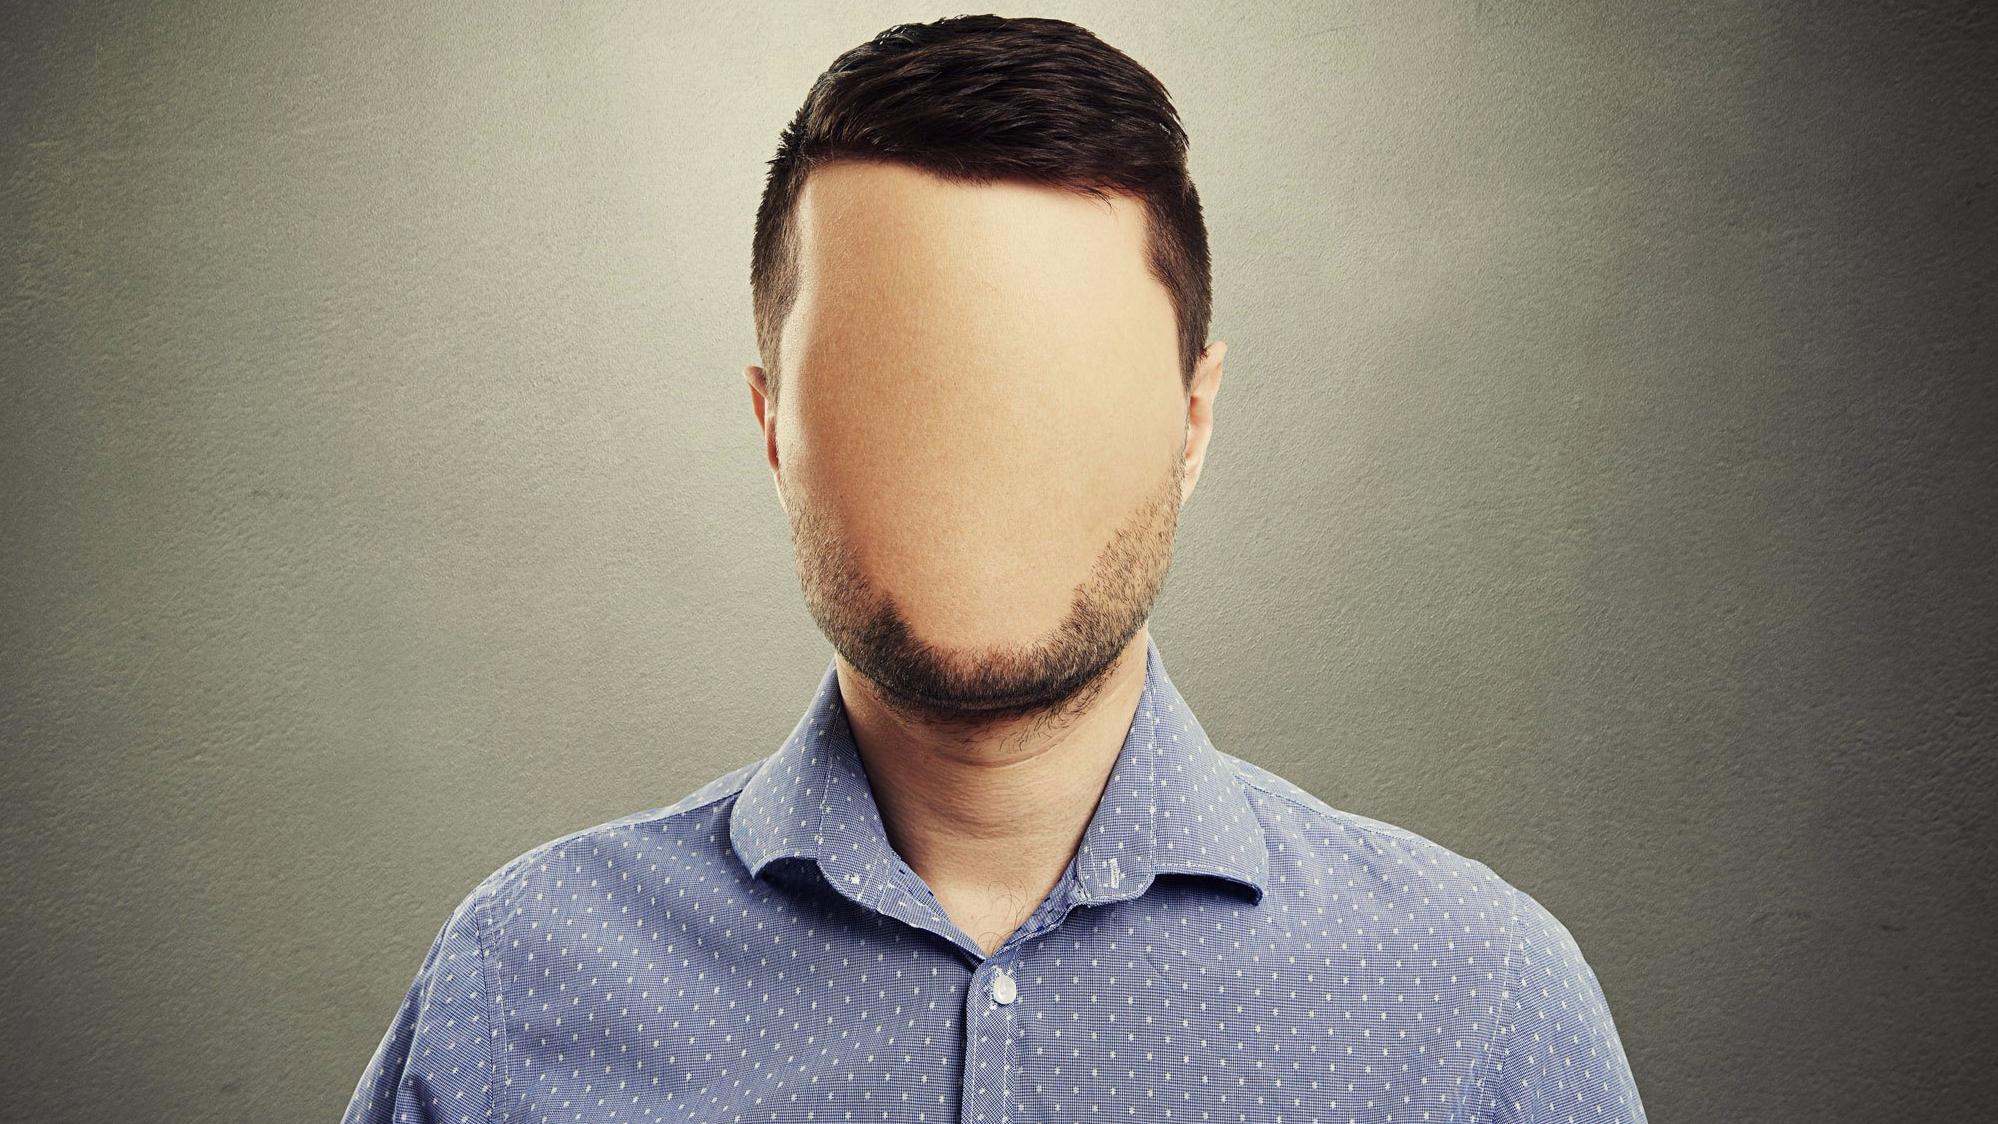 Фото голова мужика без лица крупным